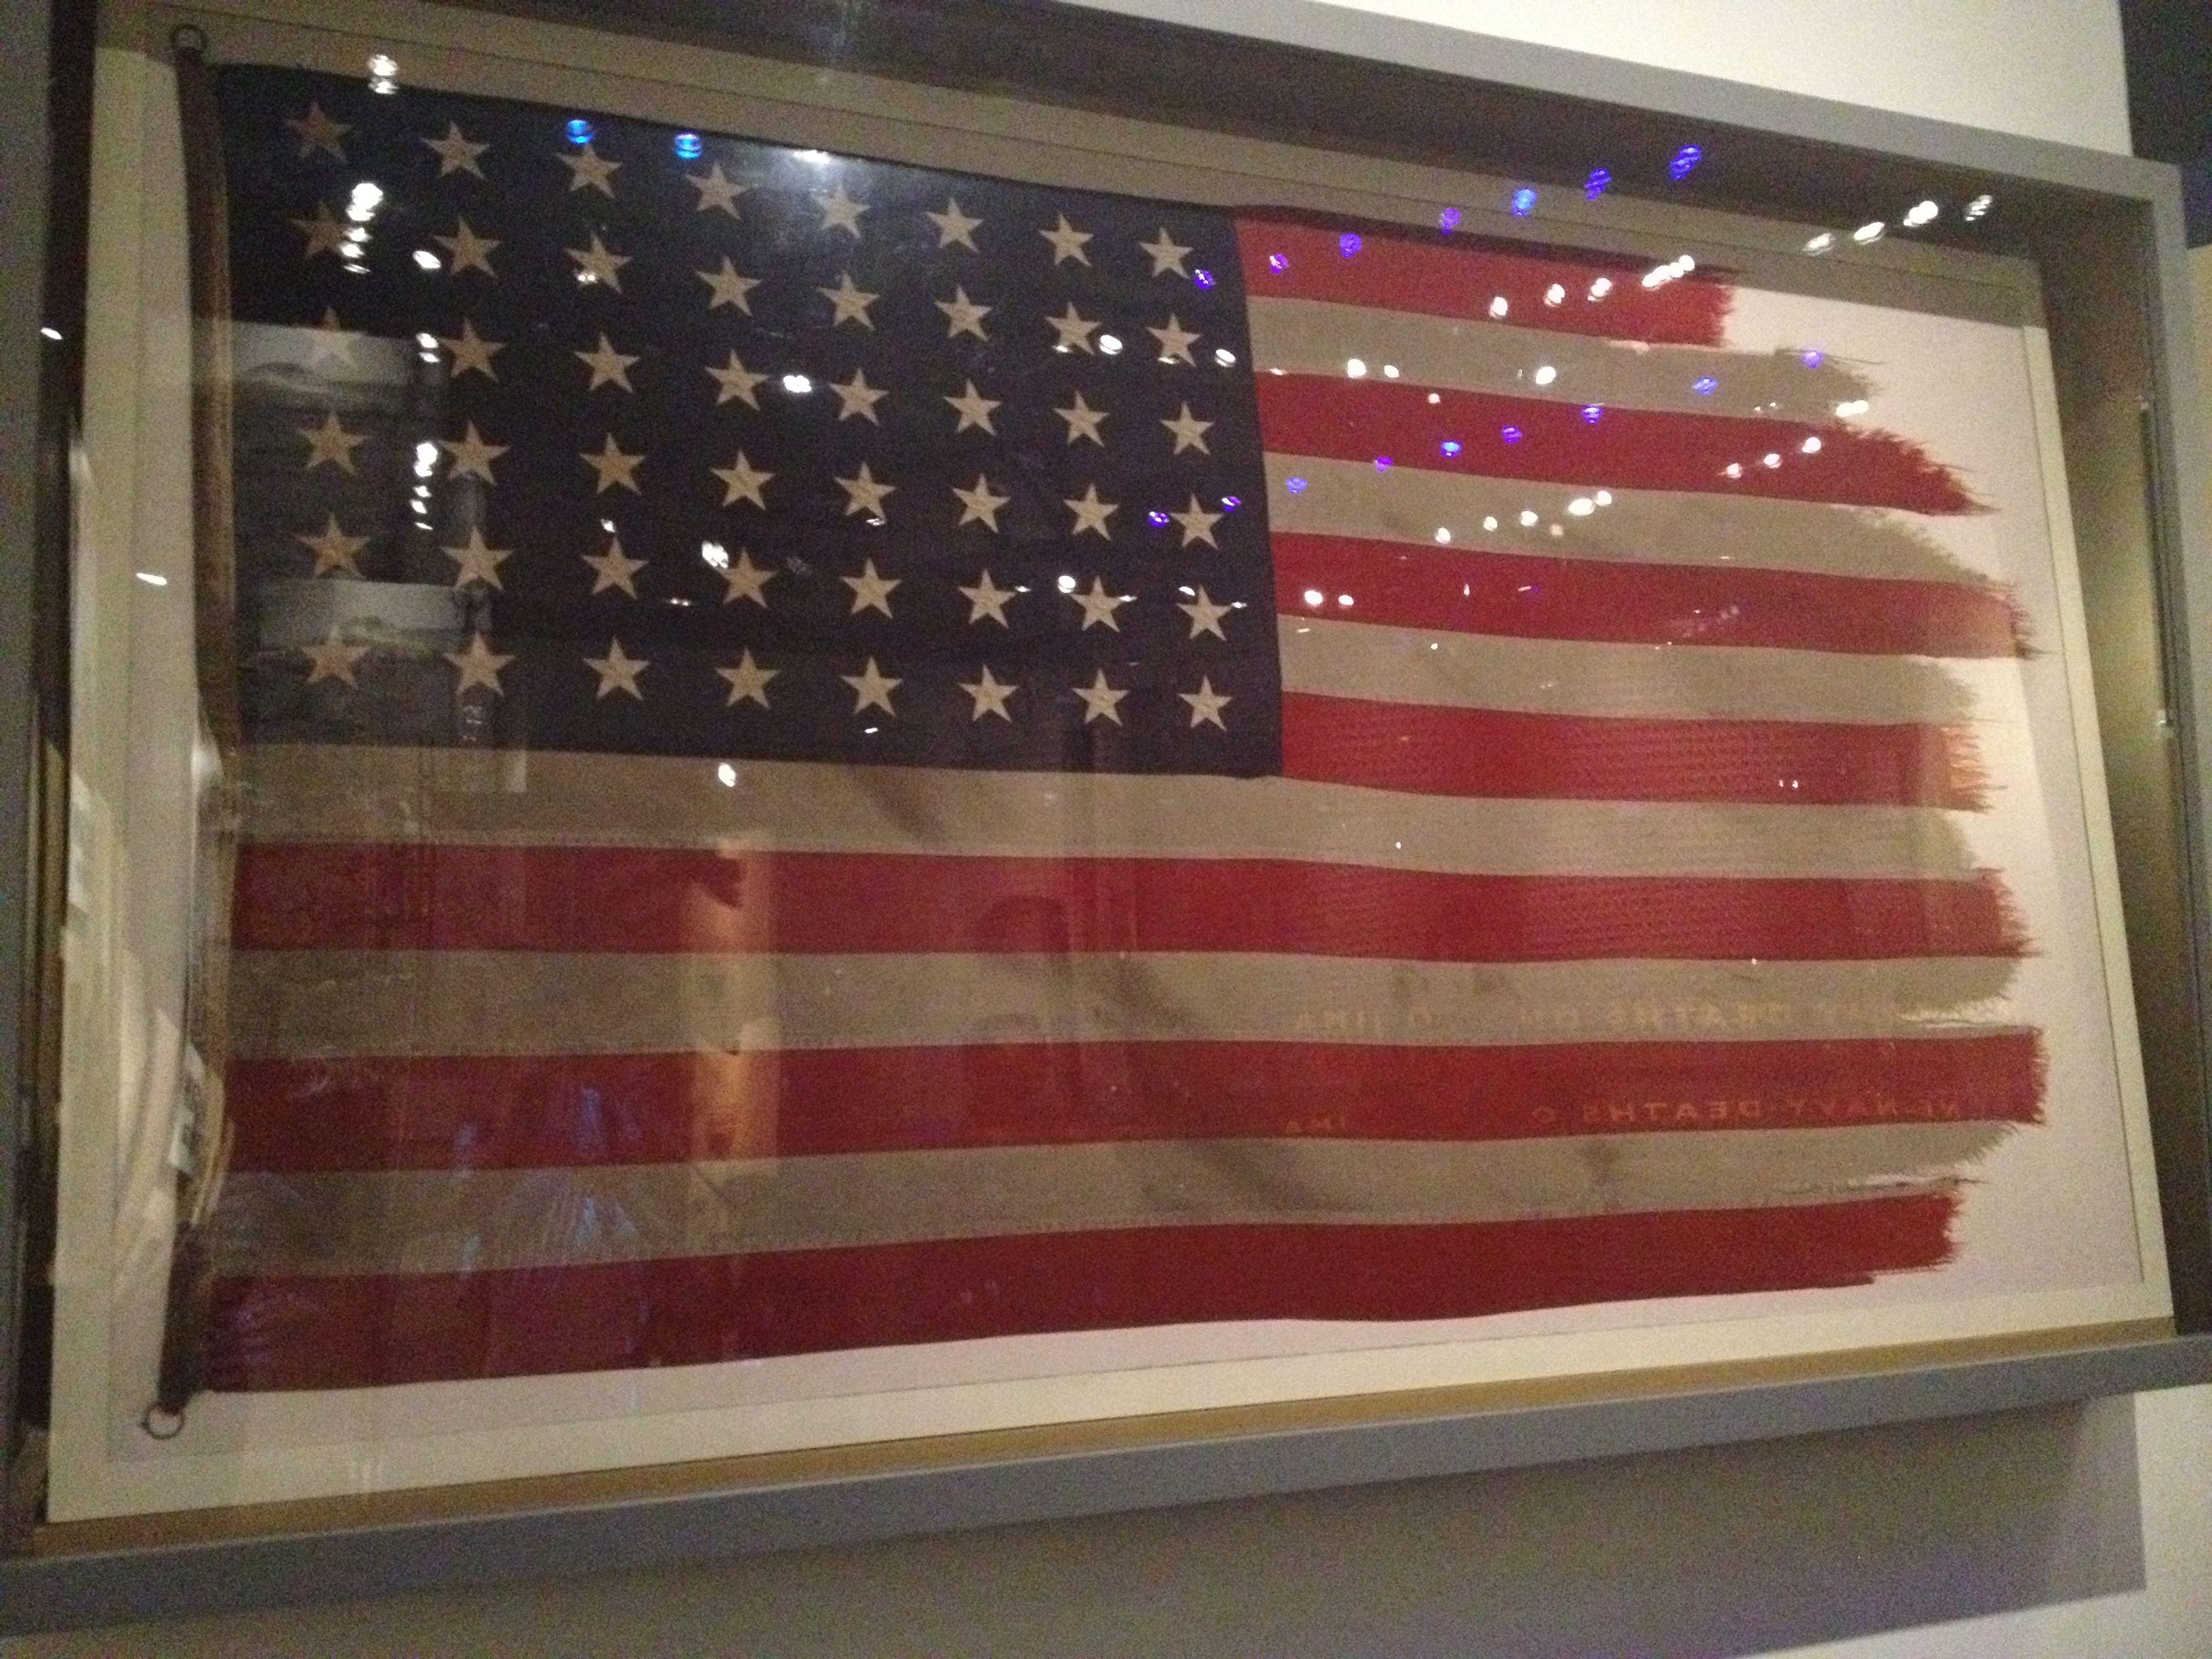 Flag Raising on Iwo Jima 6 Sizes! World War II Colorized Photo Poster: U.S